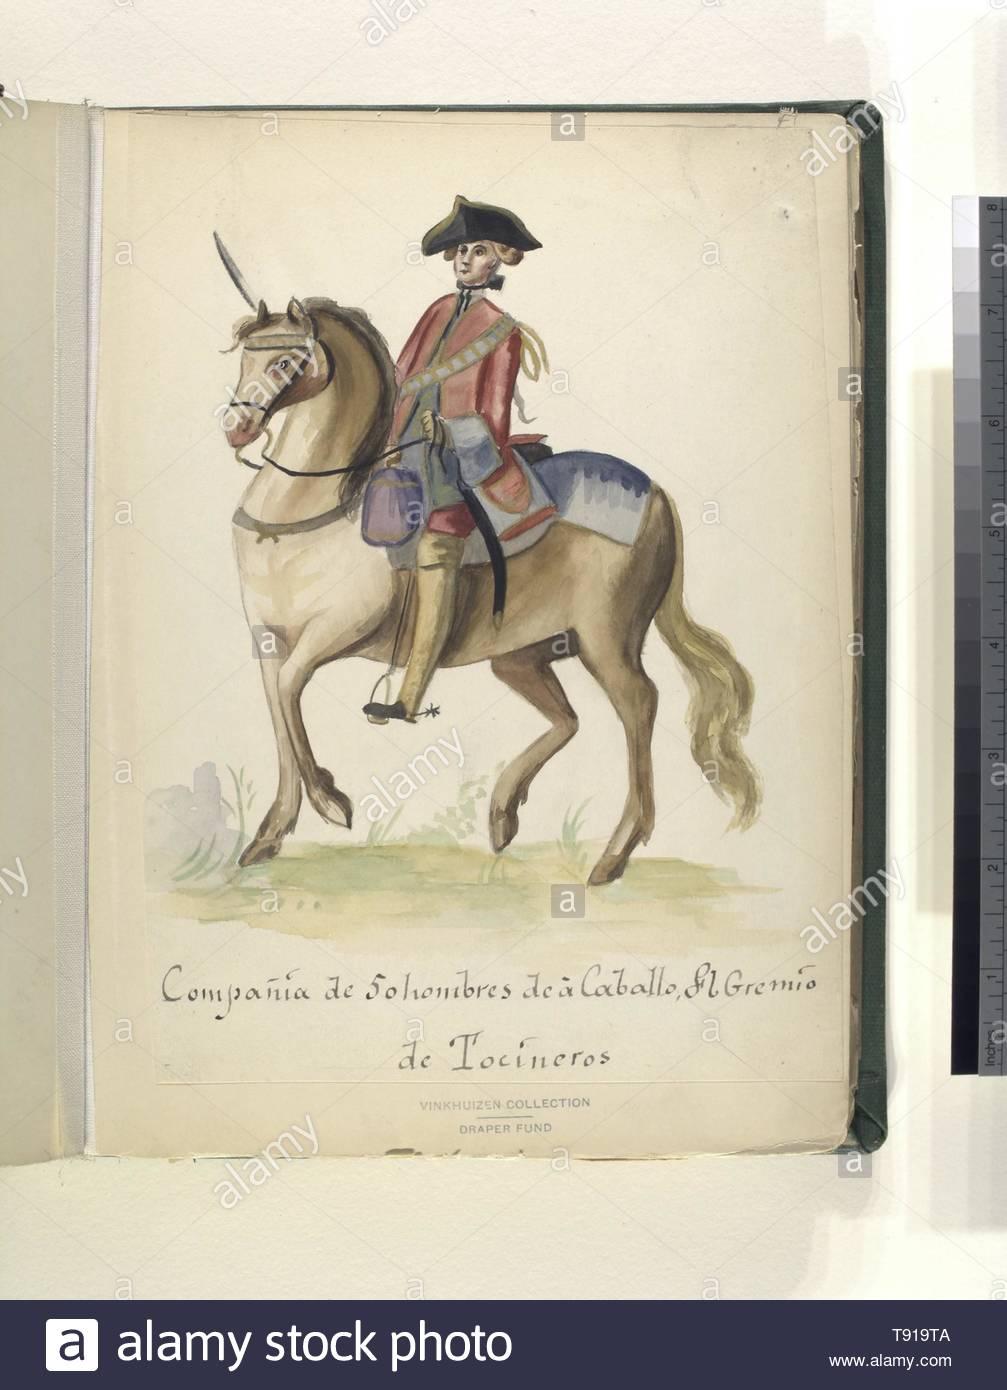 Anonymous-Compañia de 50 hombres de à caballo del gremio de tocineros - Stock Image